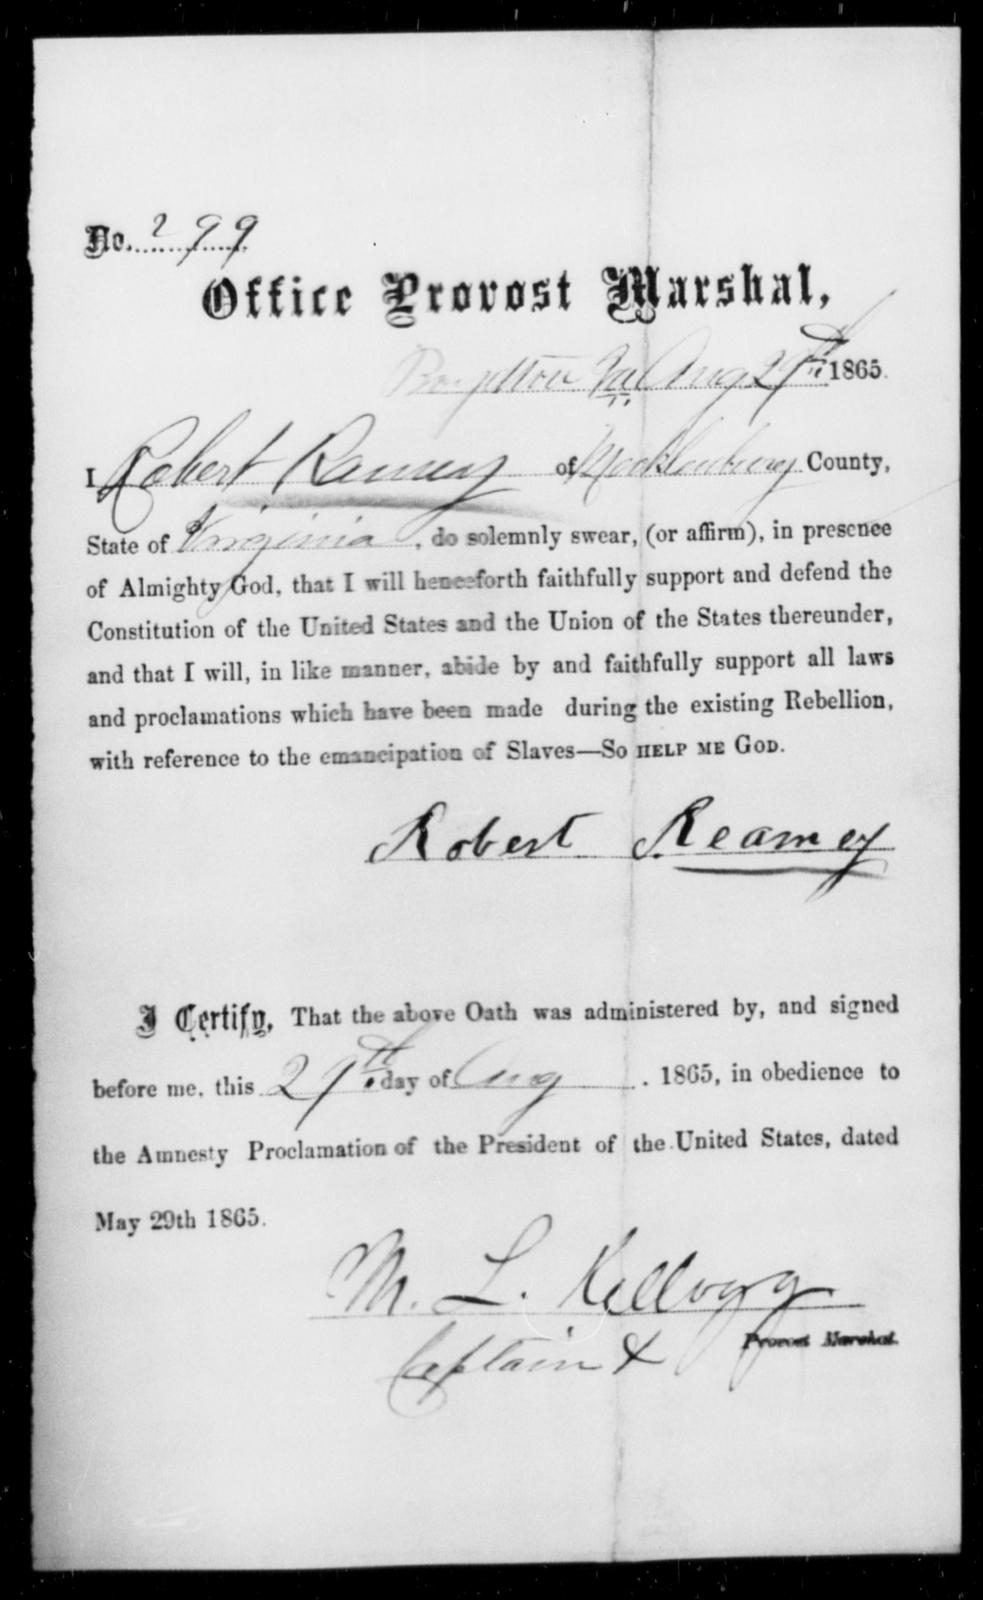 Reamey, Robert - State: Virginia - Year: 1865